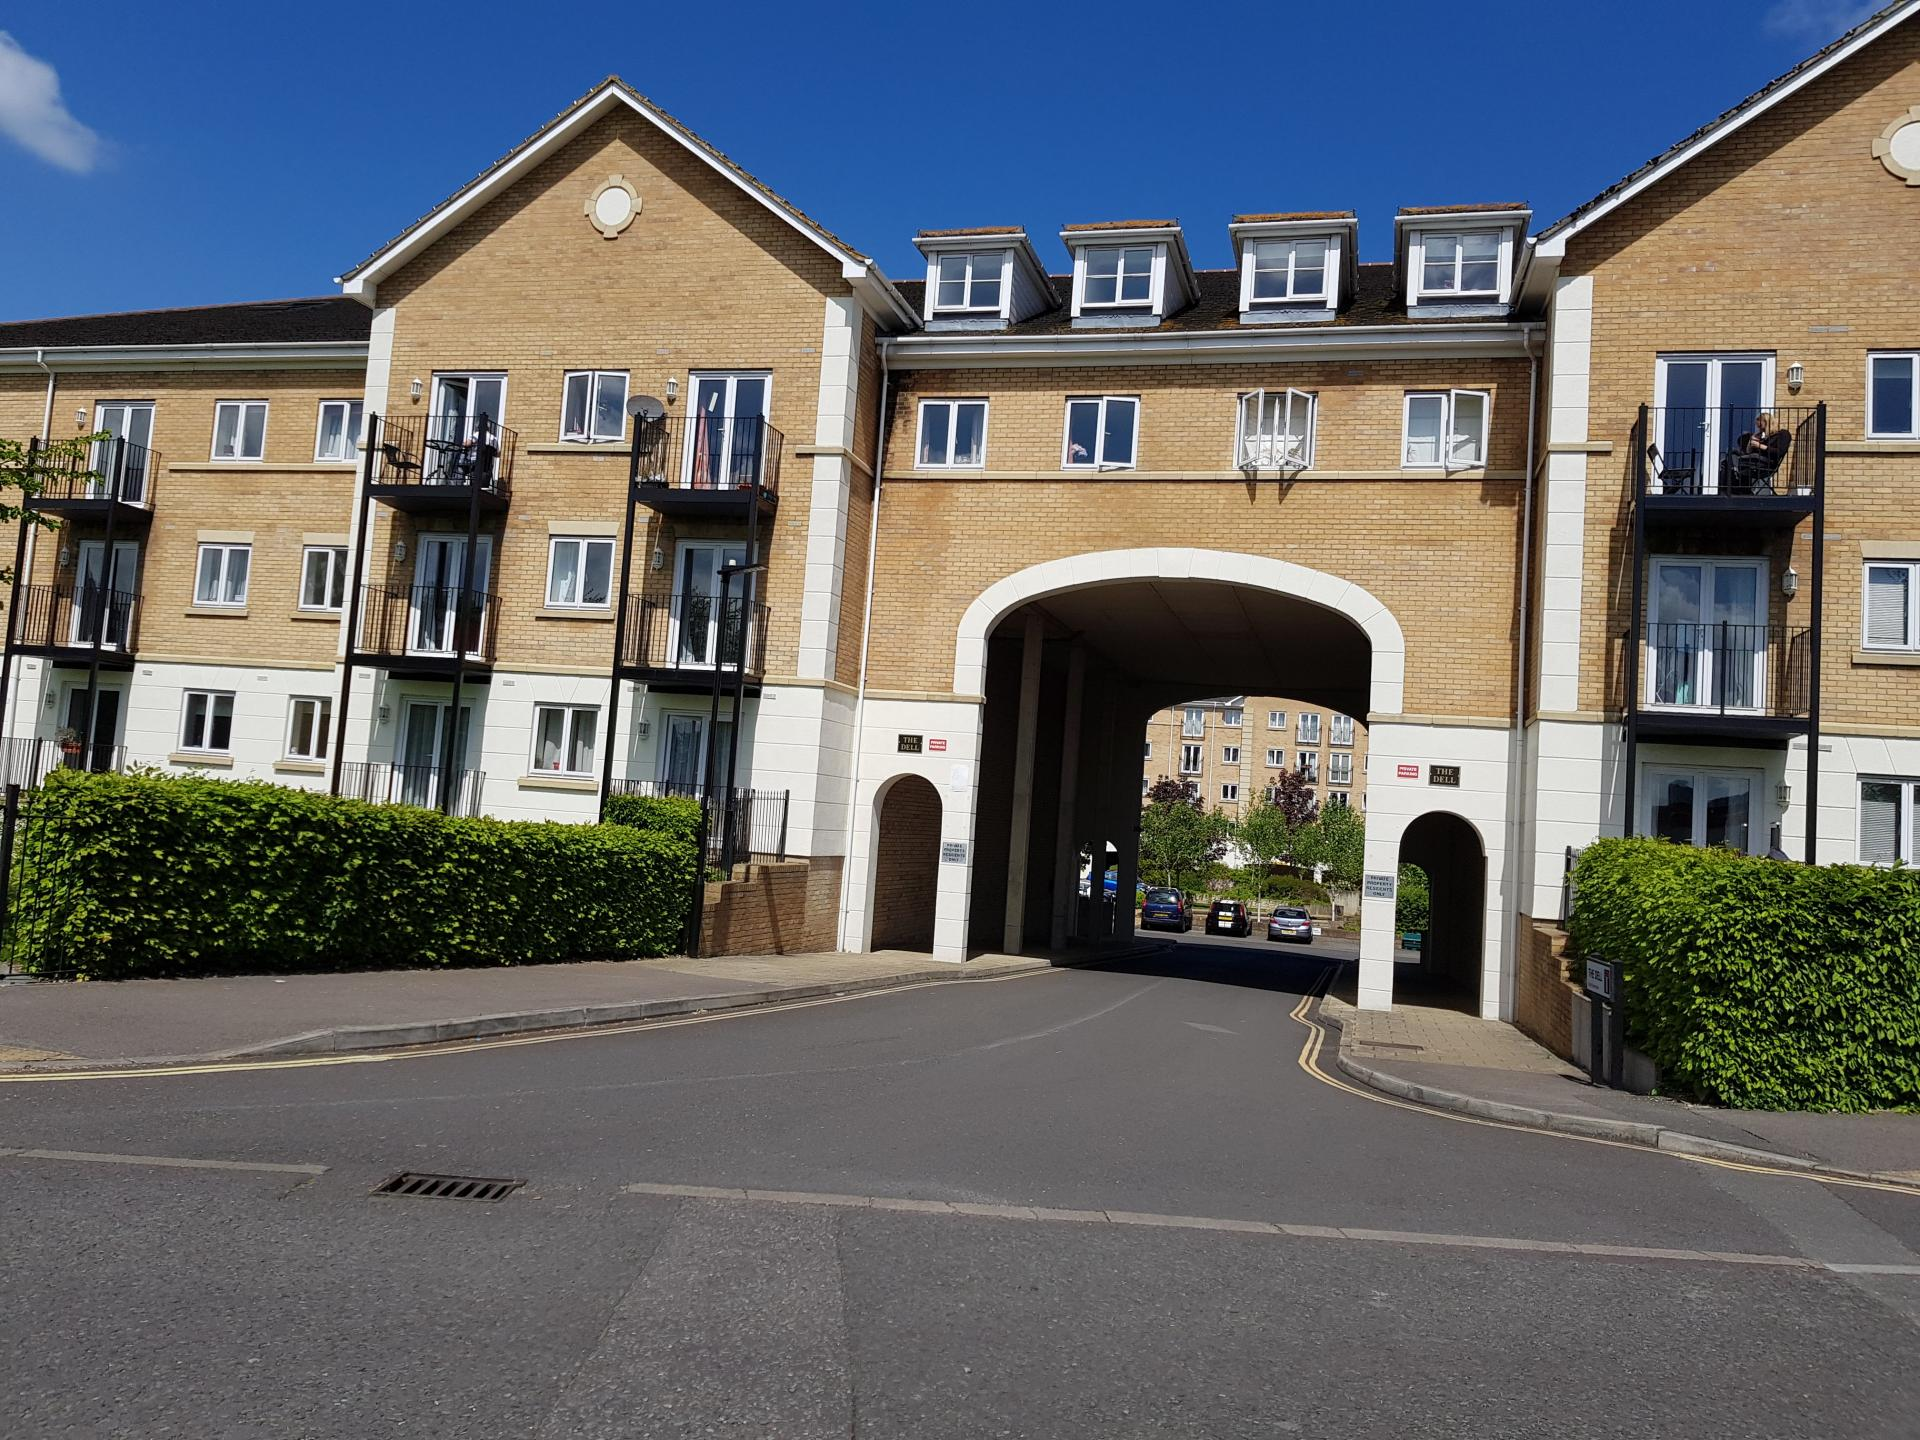 Exterior at Le Tissier Court Apartment, The Polygon, Southampton - Citybase Apartments